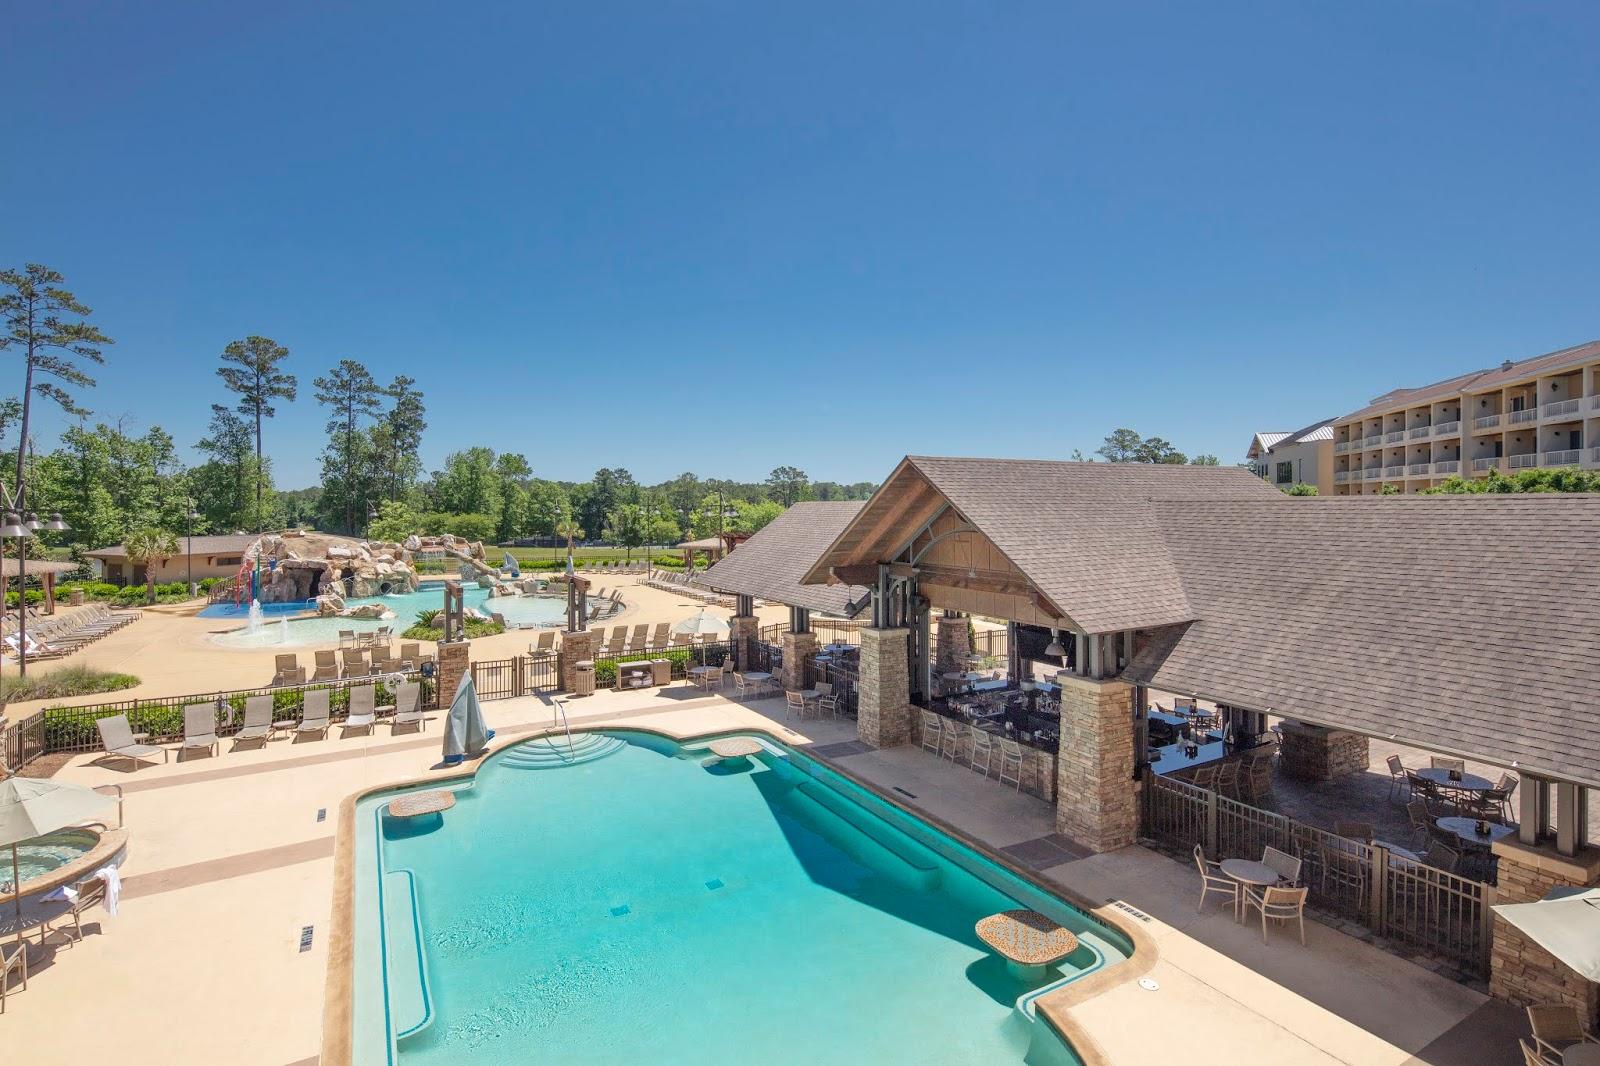 Auburn/Opelika Marriott Resort & Spa at Grand National in Opelika, Alabama